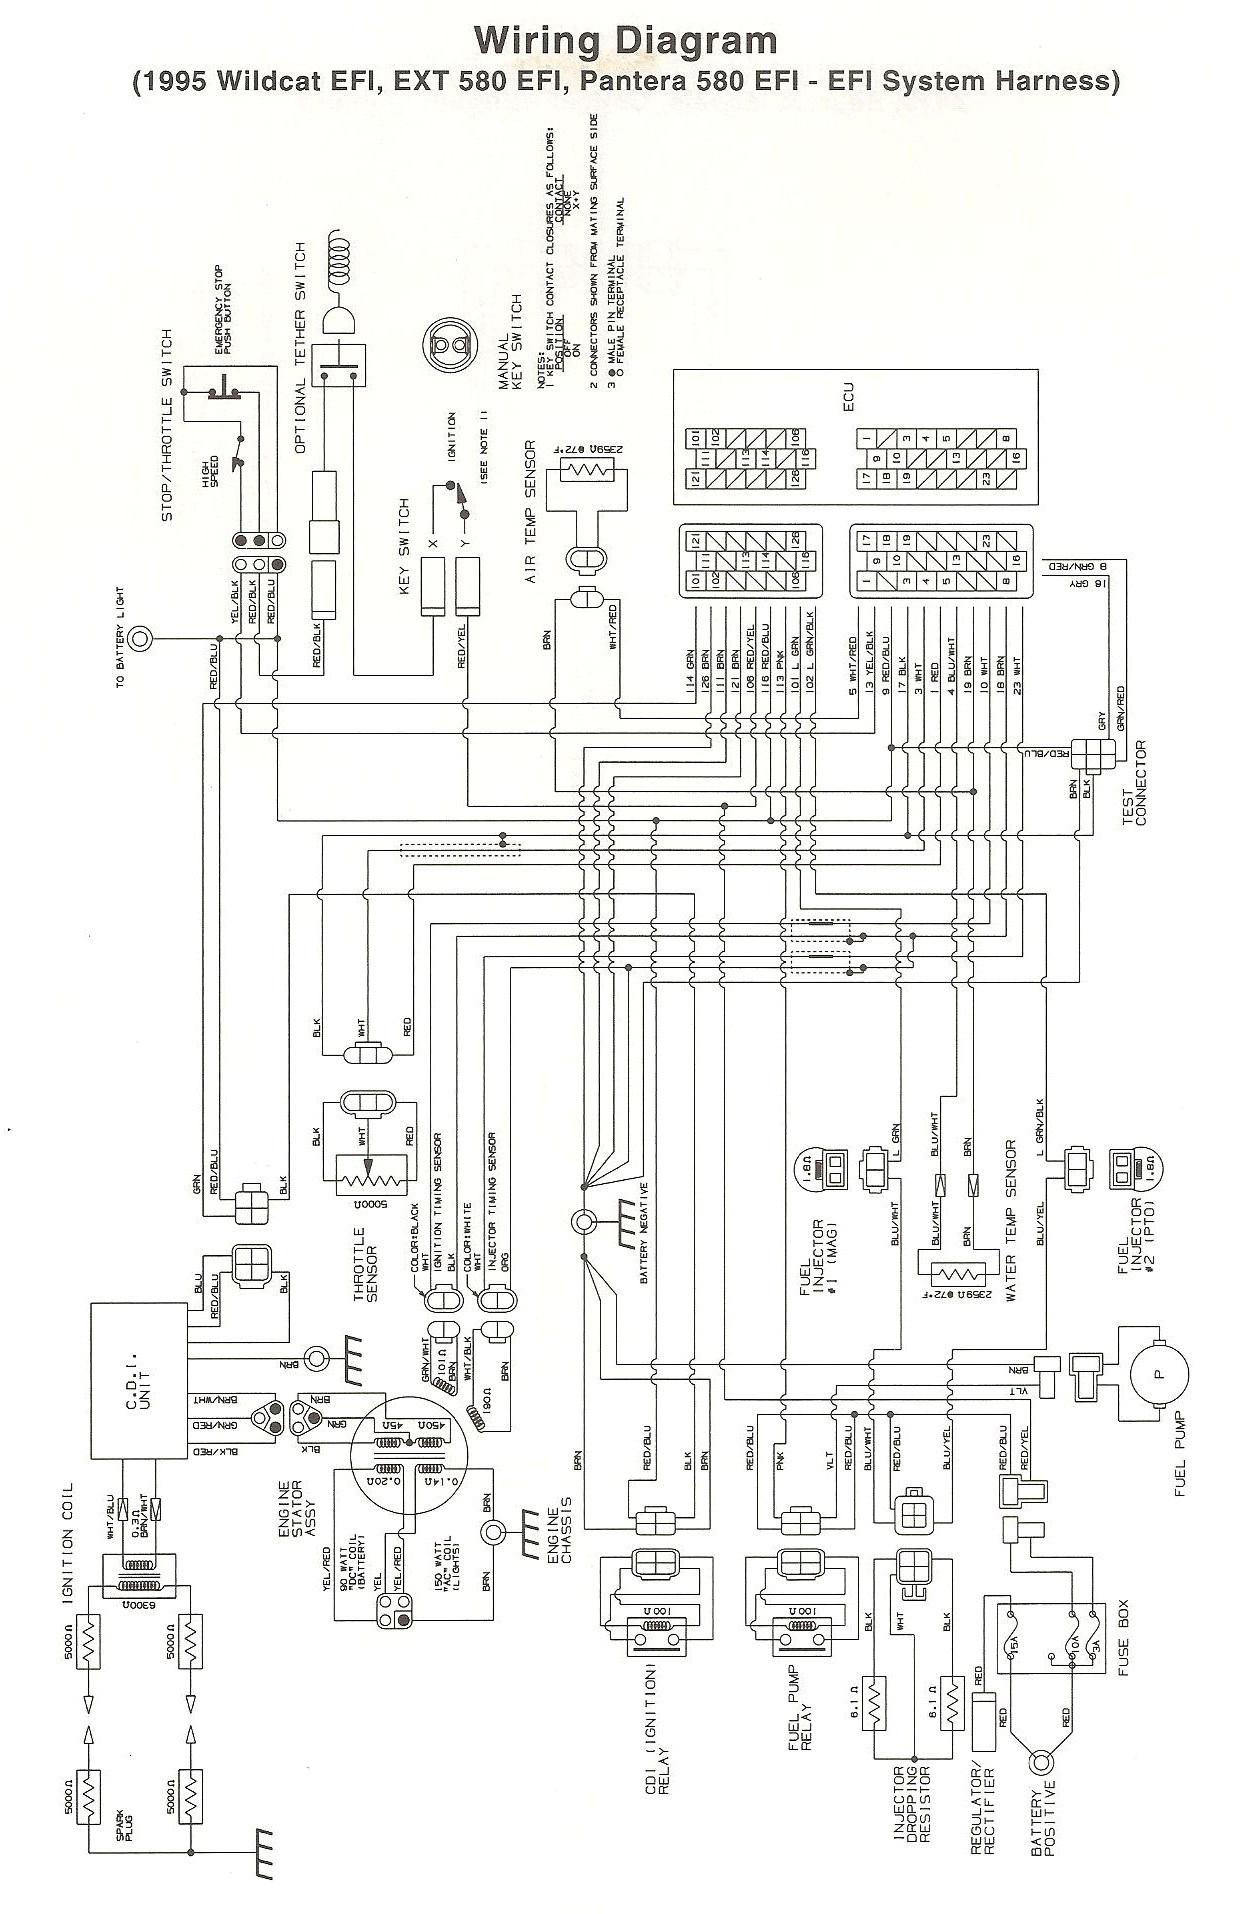 rsir wiring diagram wiring diagram database wiring diagram for super 66 or 660 gas 12 volt